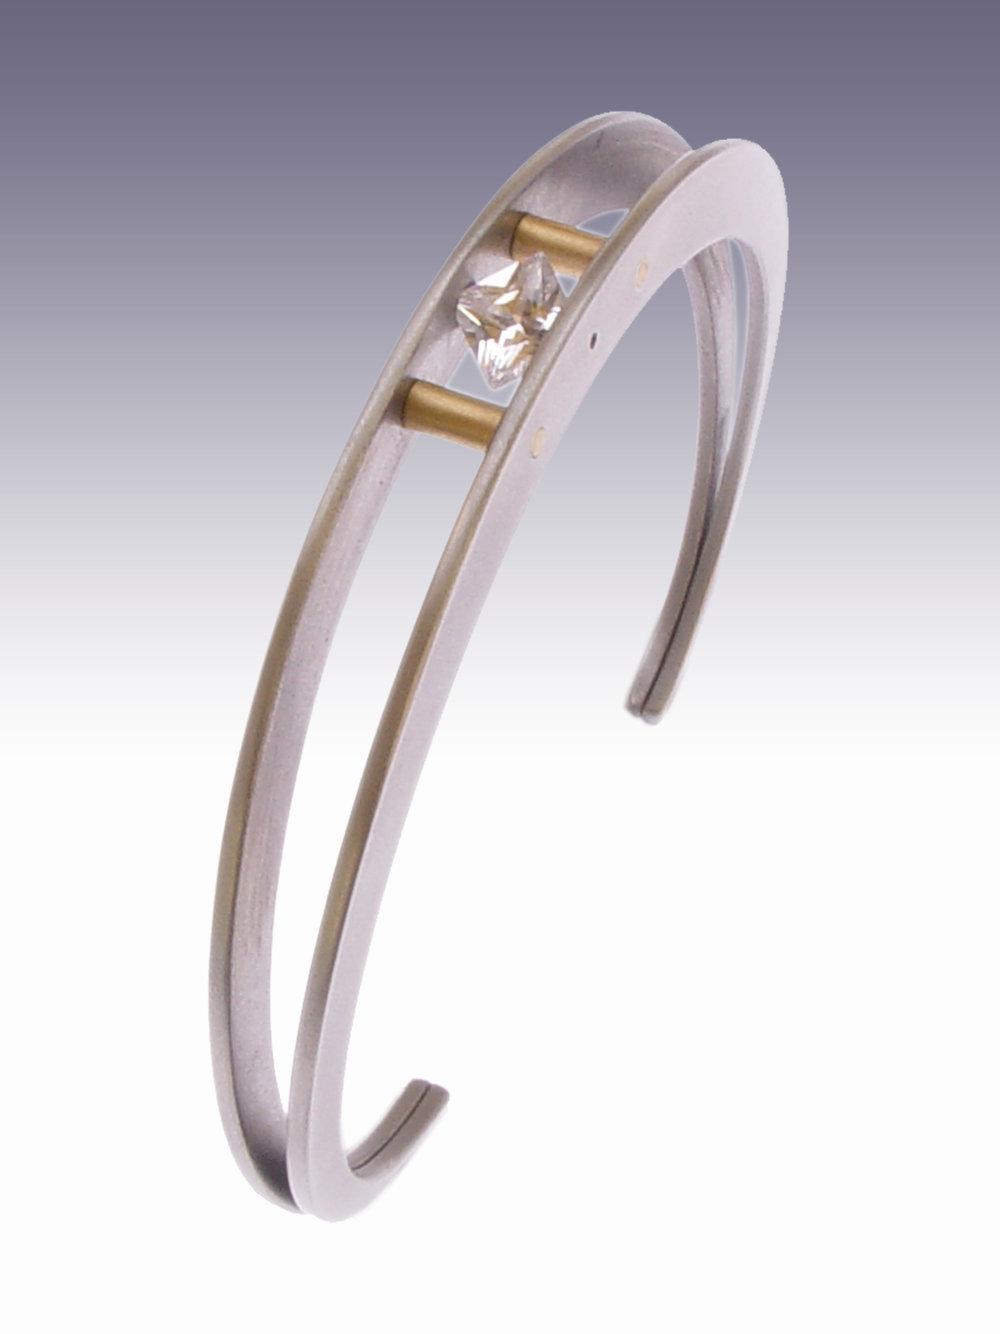 FungandBedford_jewellery-spin-titanium-bracelet_£xxx_AshleyBedford.jpg.jpg